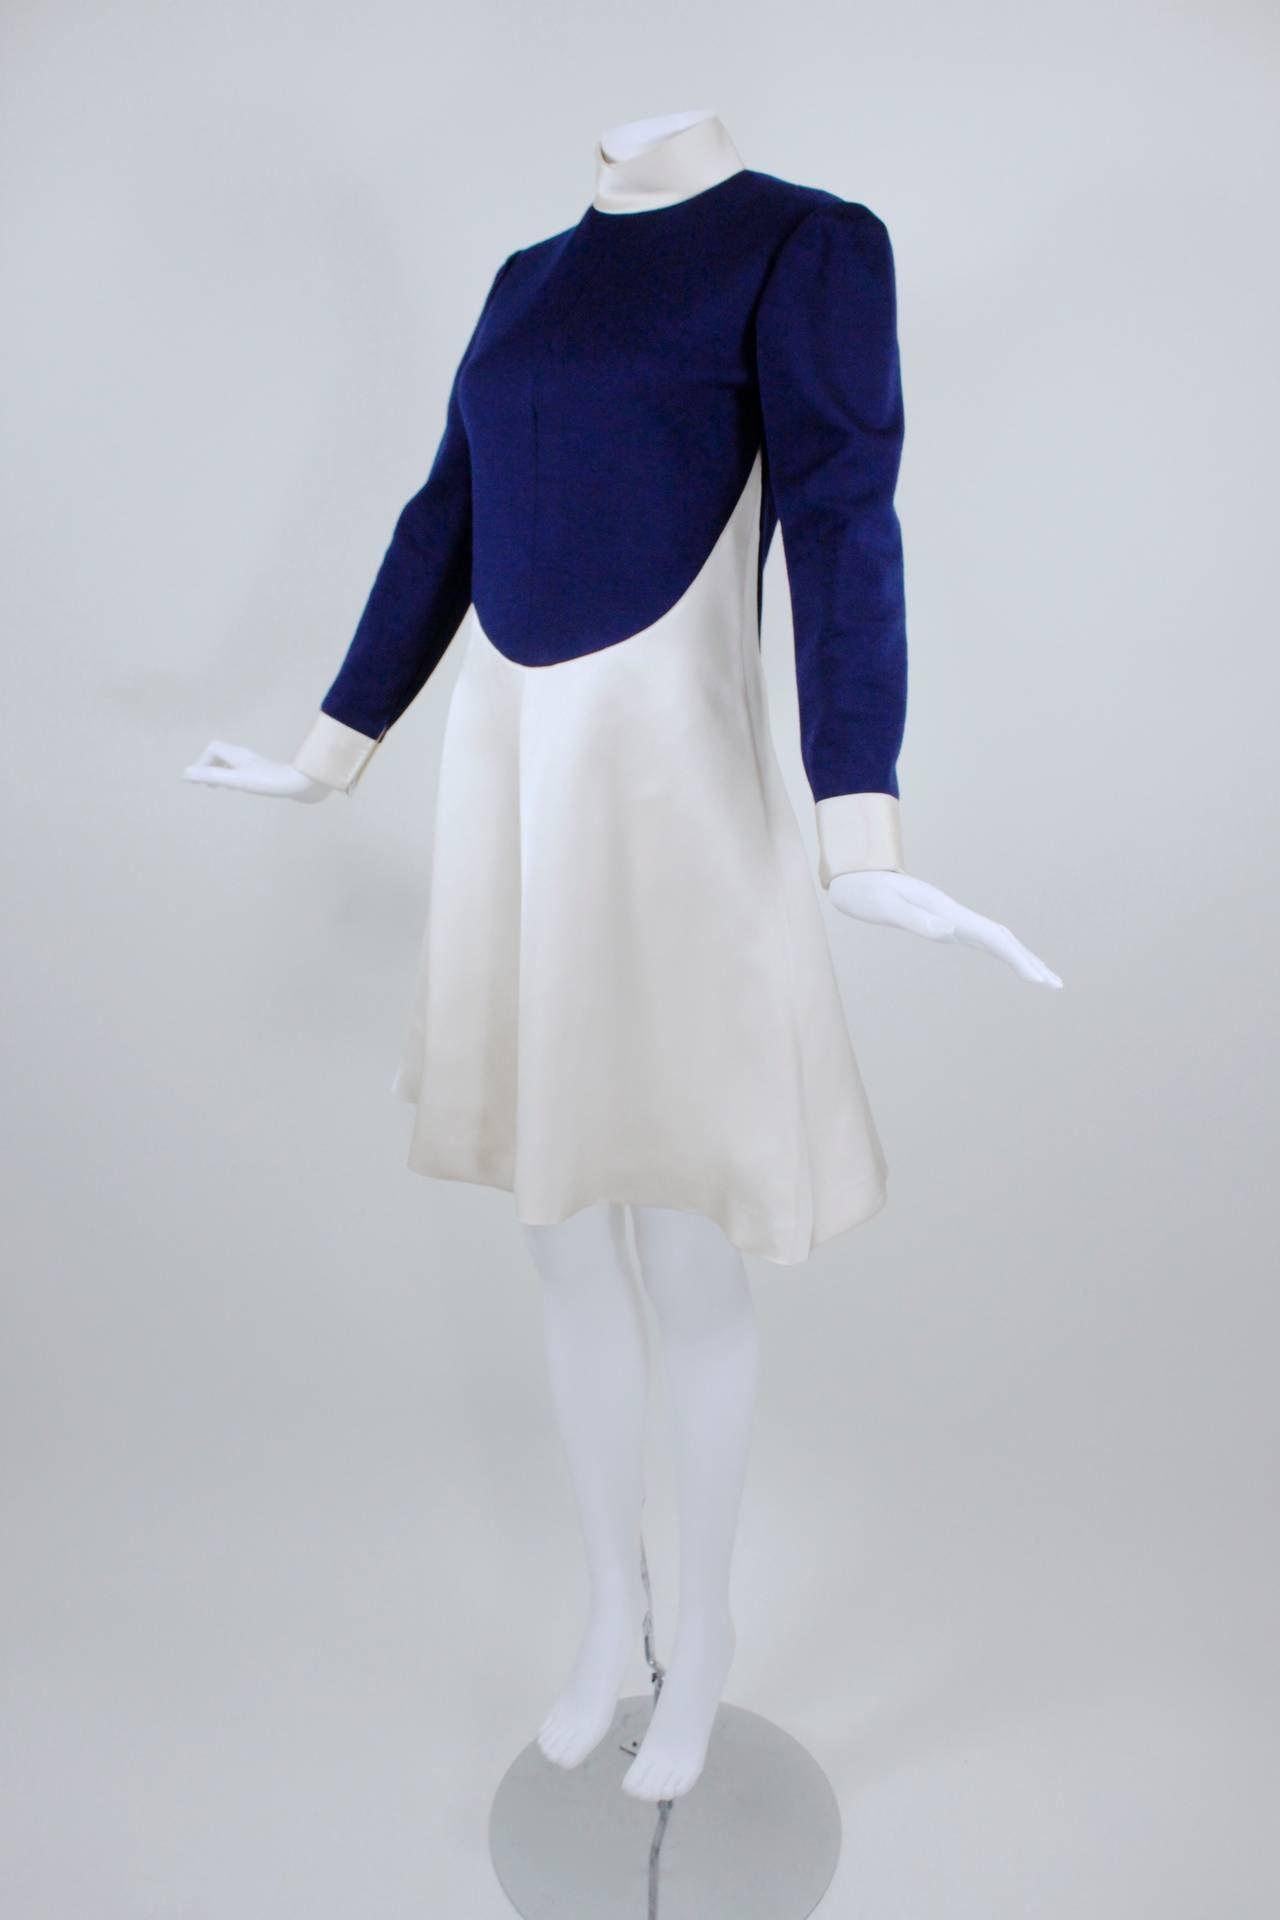 1960s Geoffrey Beene Navy Wool and Eggshell Mod Dress 3